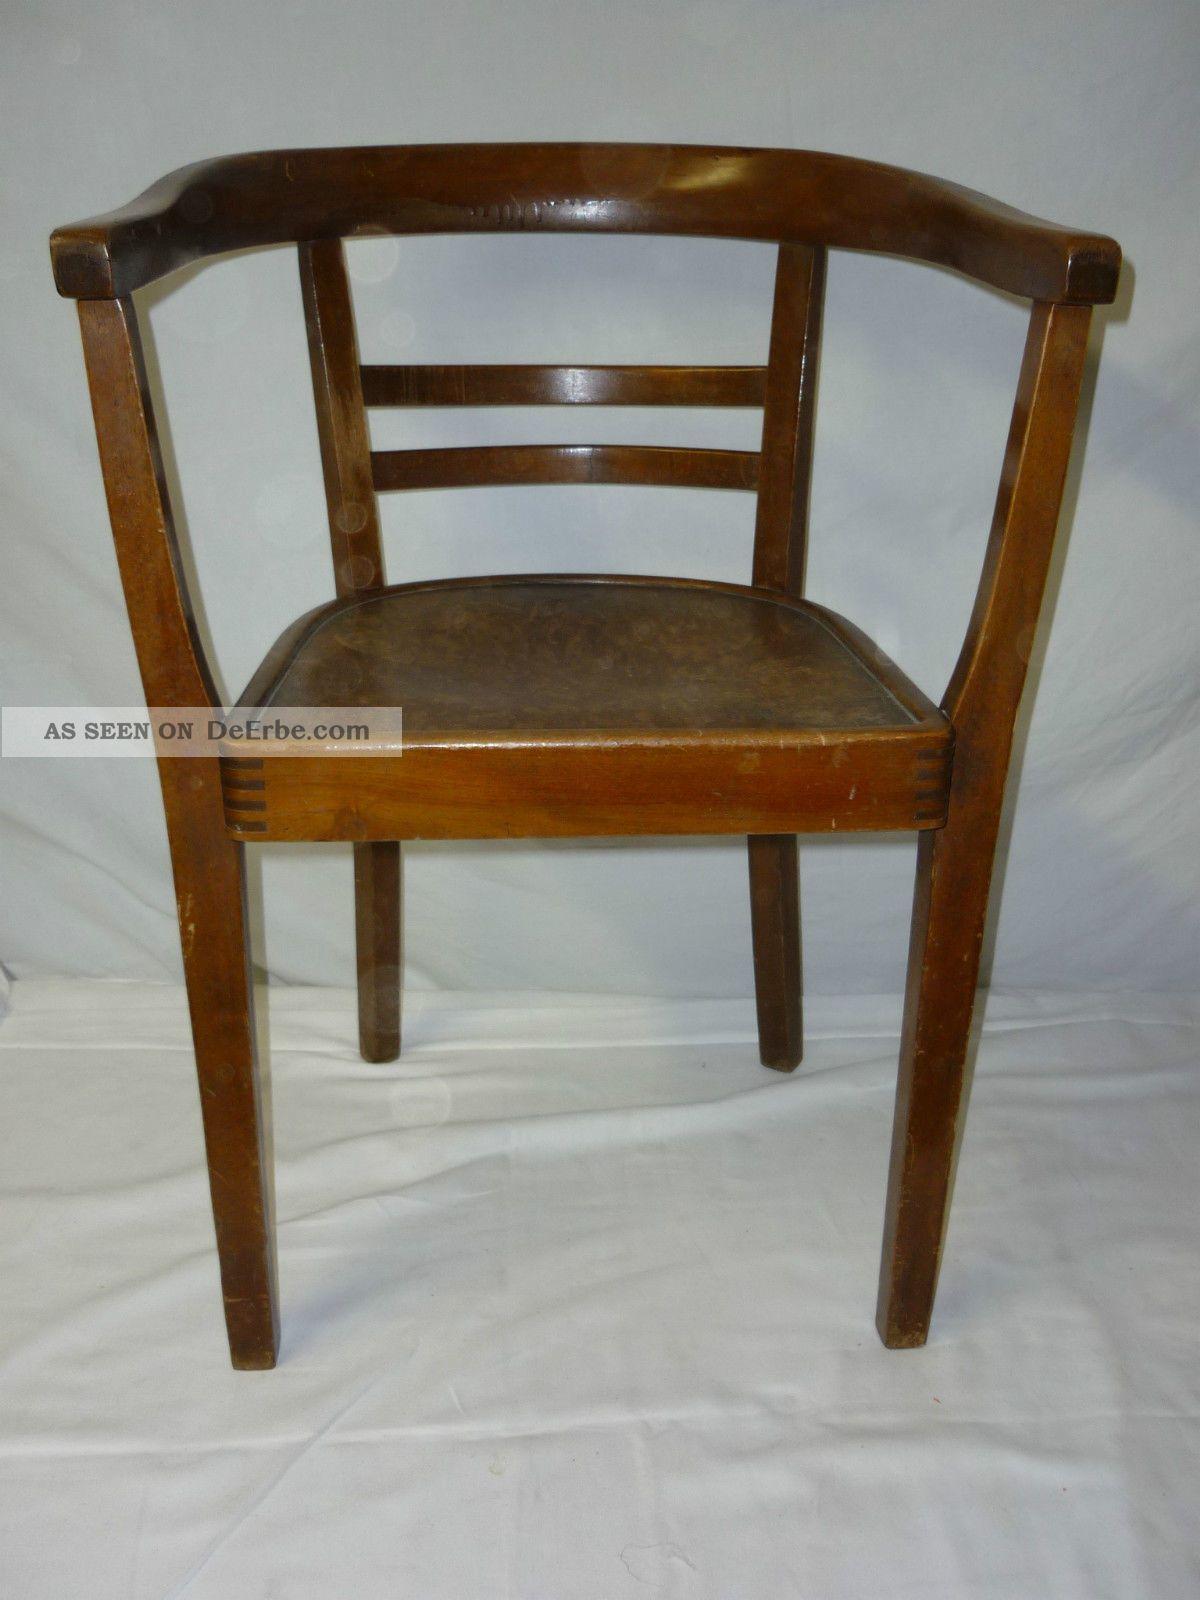 Armlehnstuhl bauhaus art deco gropius bugholz stuhl for Armlehnstuhl plastik